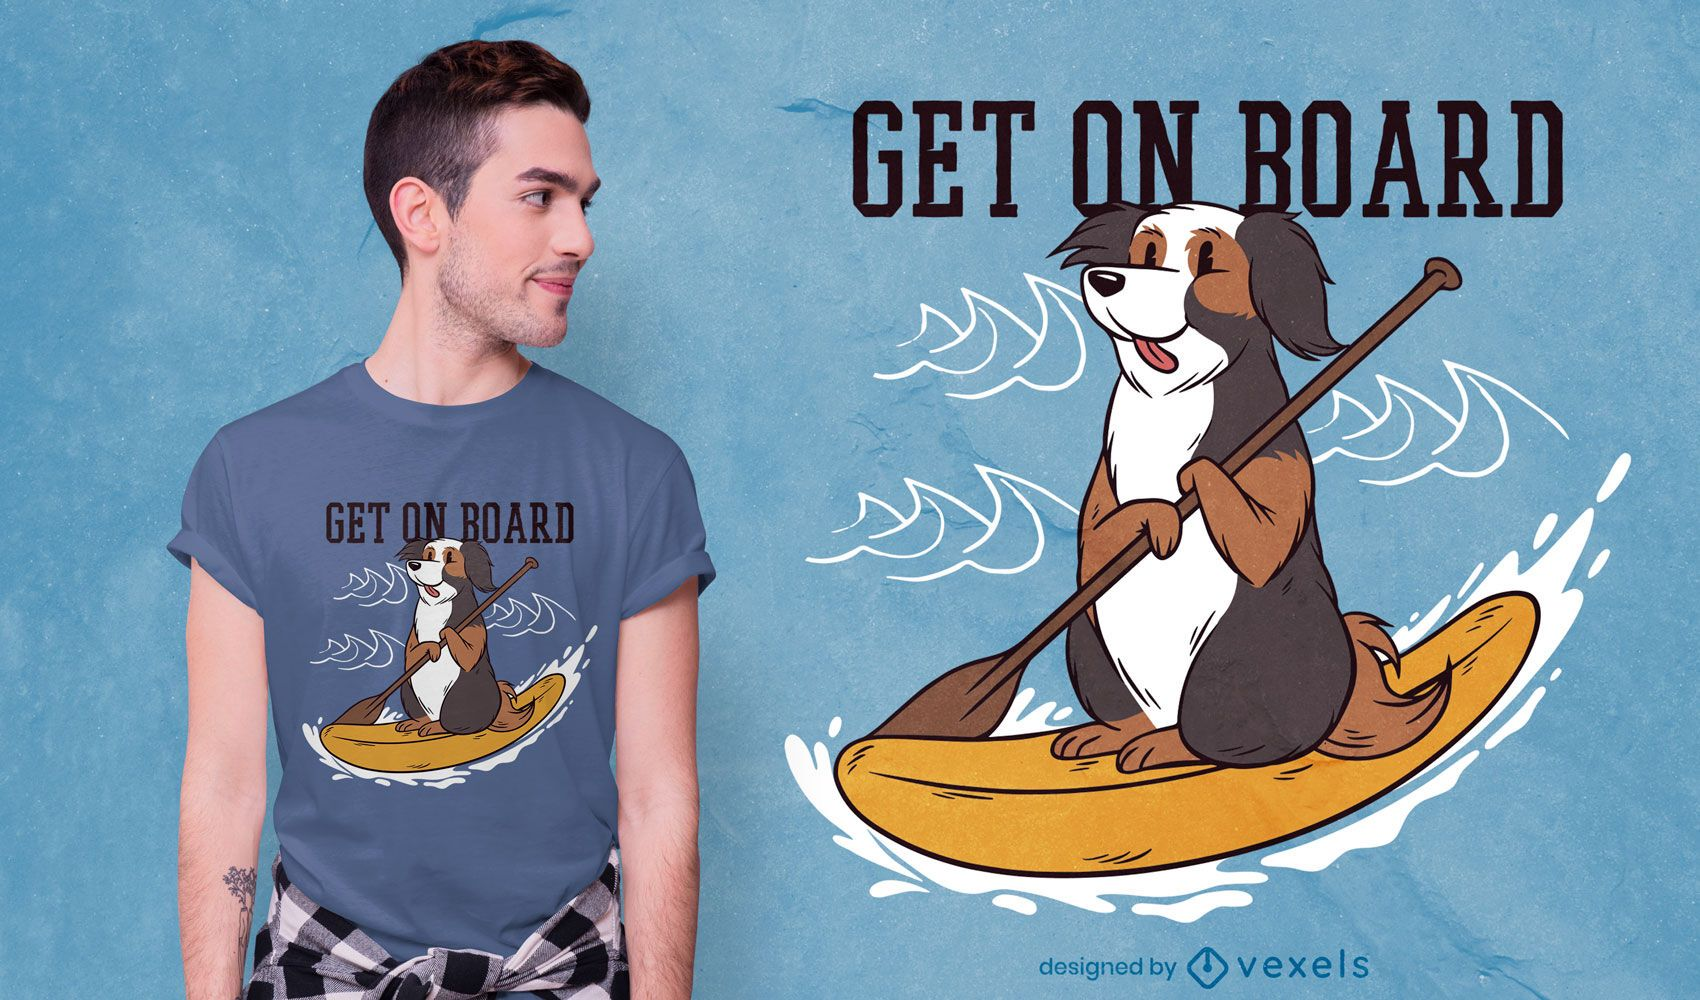 Get on board t-shirt design